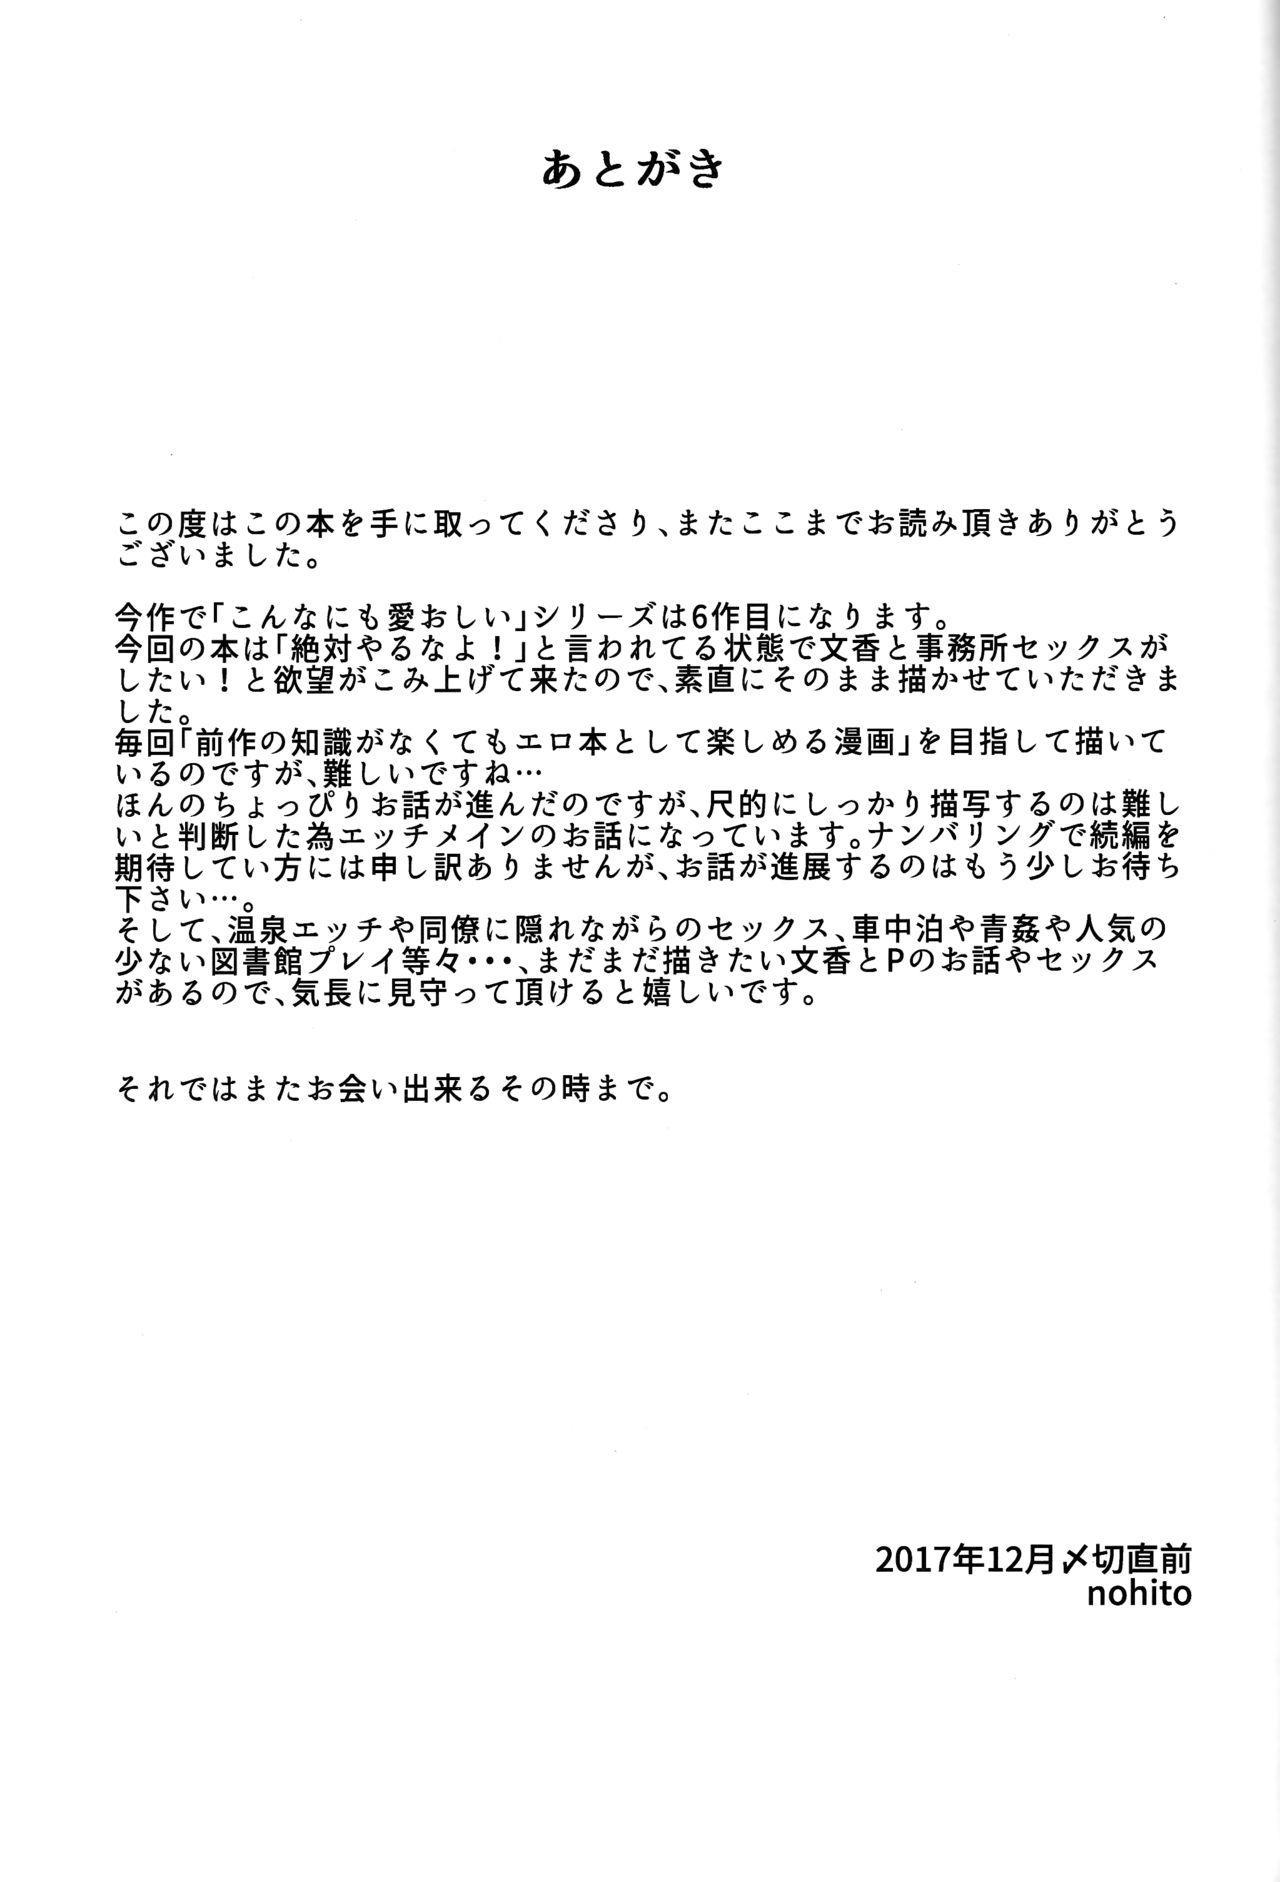 Futarikiri - Konna ni mo Itooshii 1.75 23